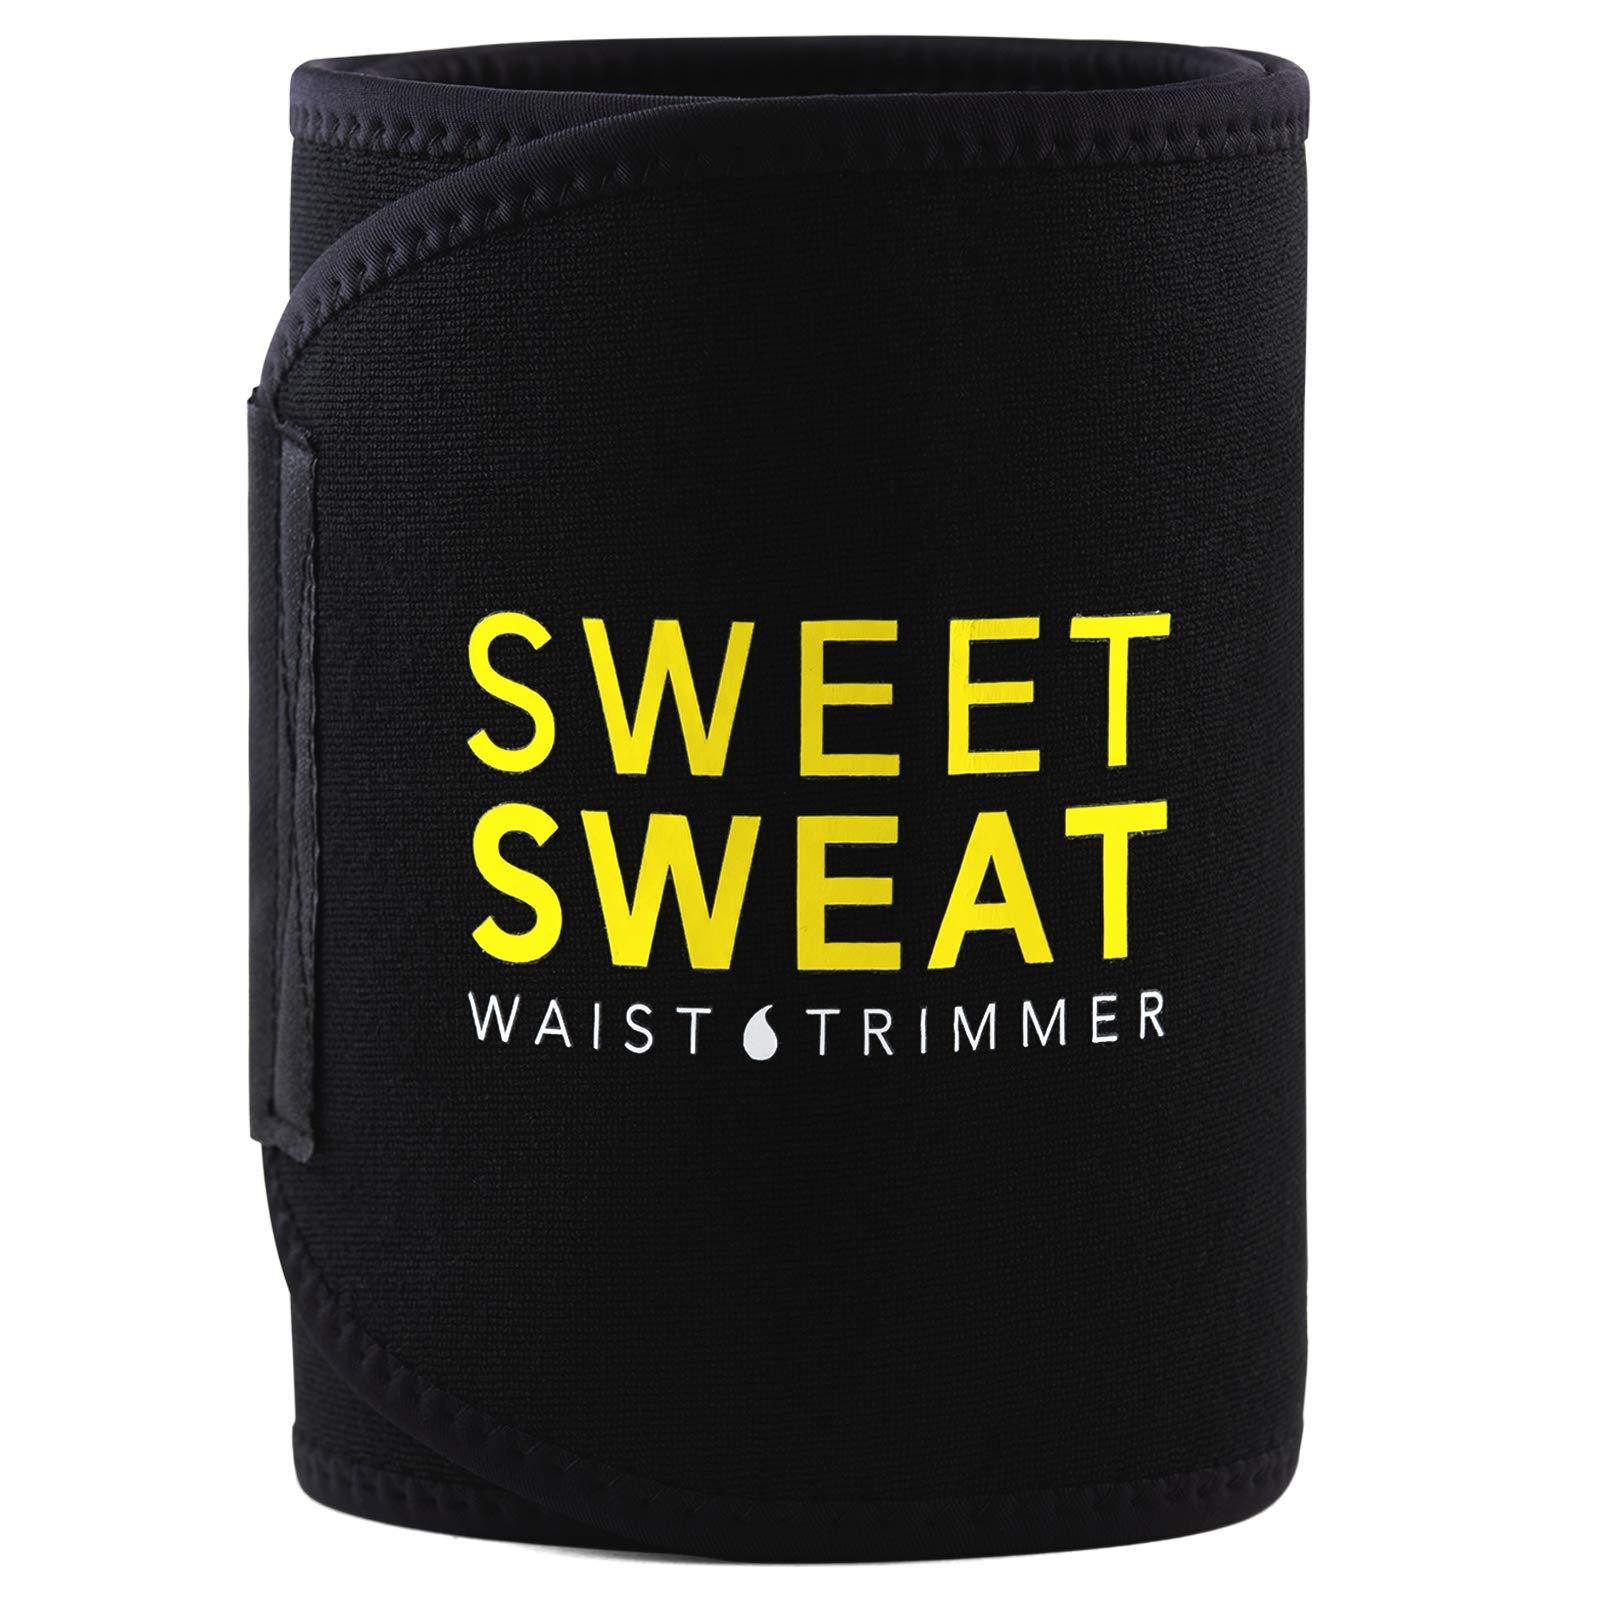 Sweet Sweat Waist Trimmer with Sample of Sweet Sweat Workout Enhancer gel, Medium